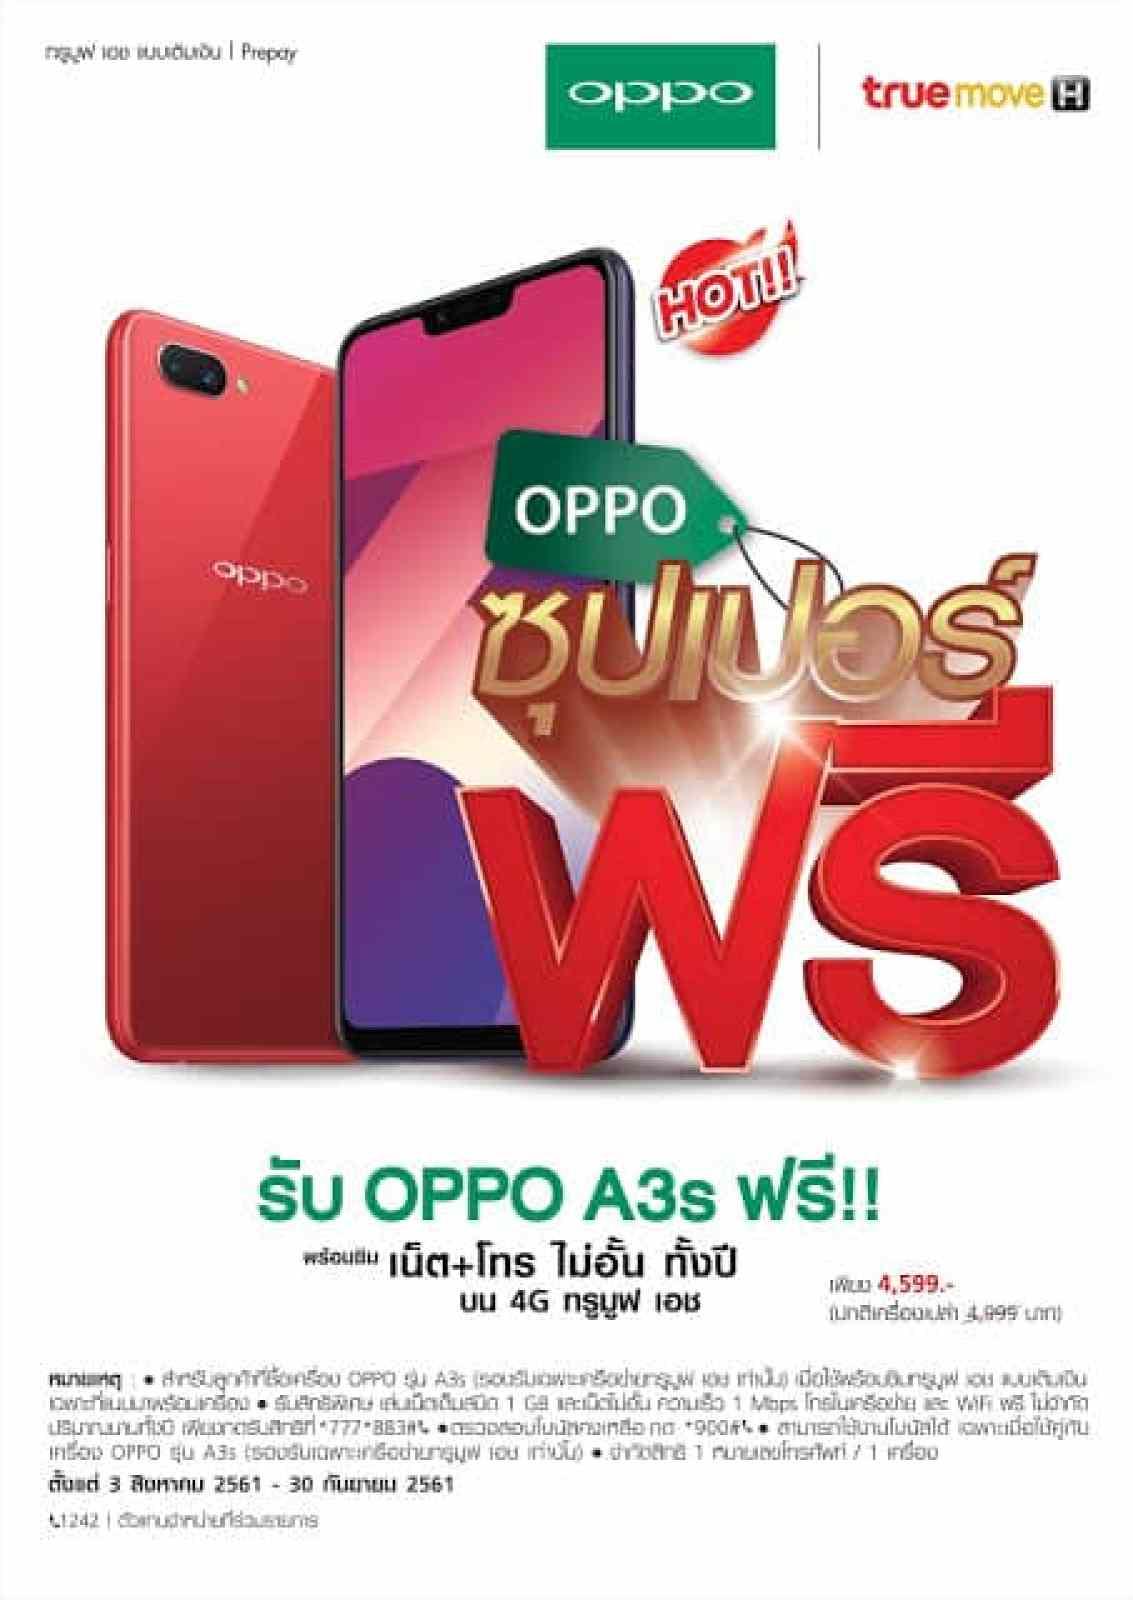 - PROMOTION 2 - OPPO จัดโปร OPPO Super Free จ่ายค่าแพคเกจเพียงแค่ 4,599 บาท รับ OPPO A3s ไปใช้ฟรีๆ